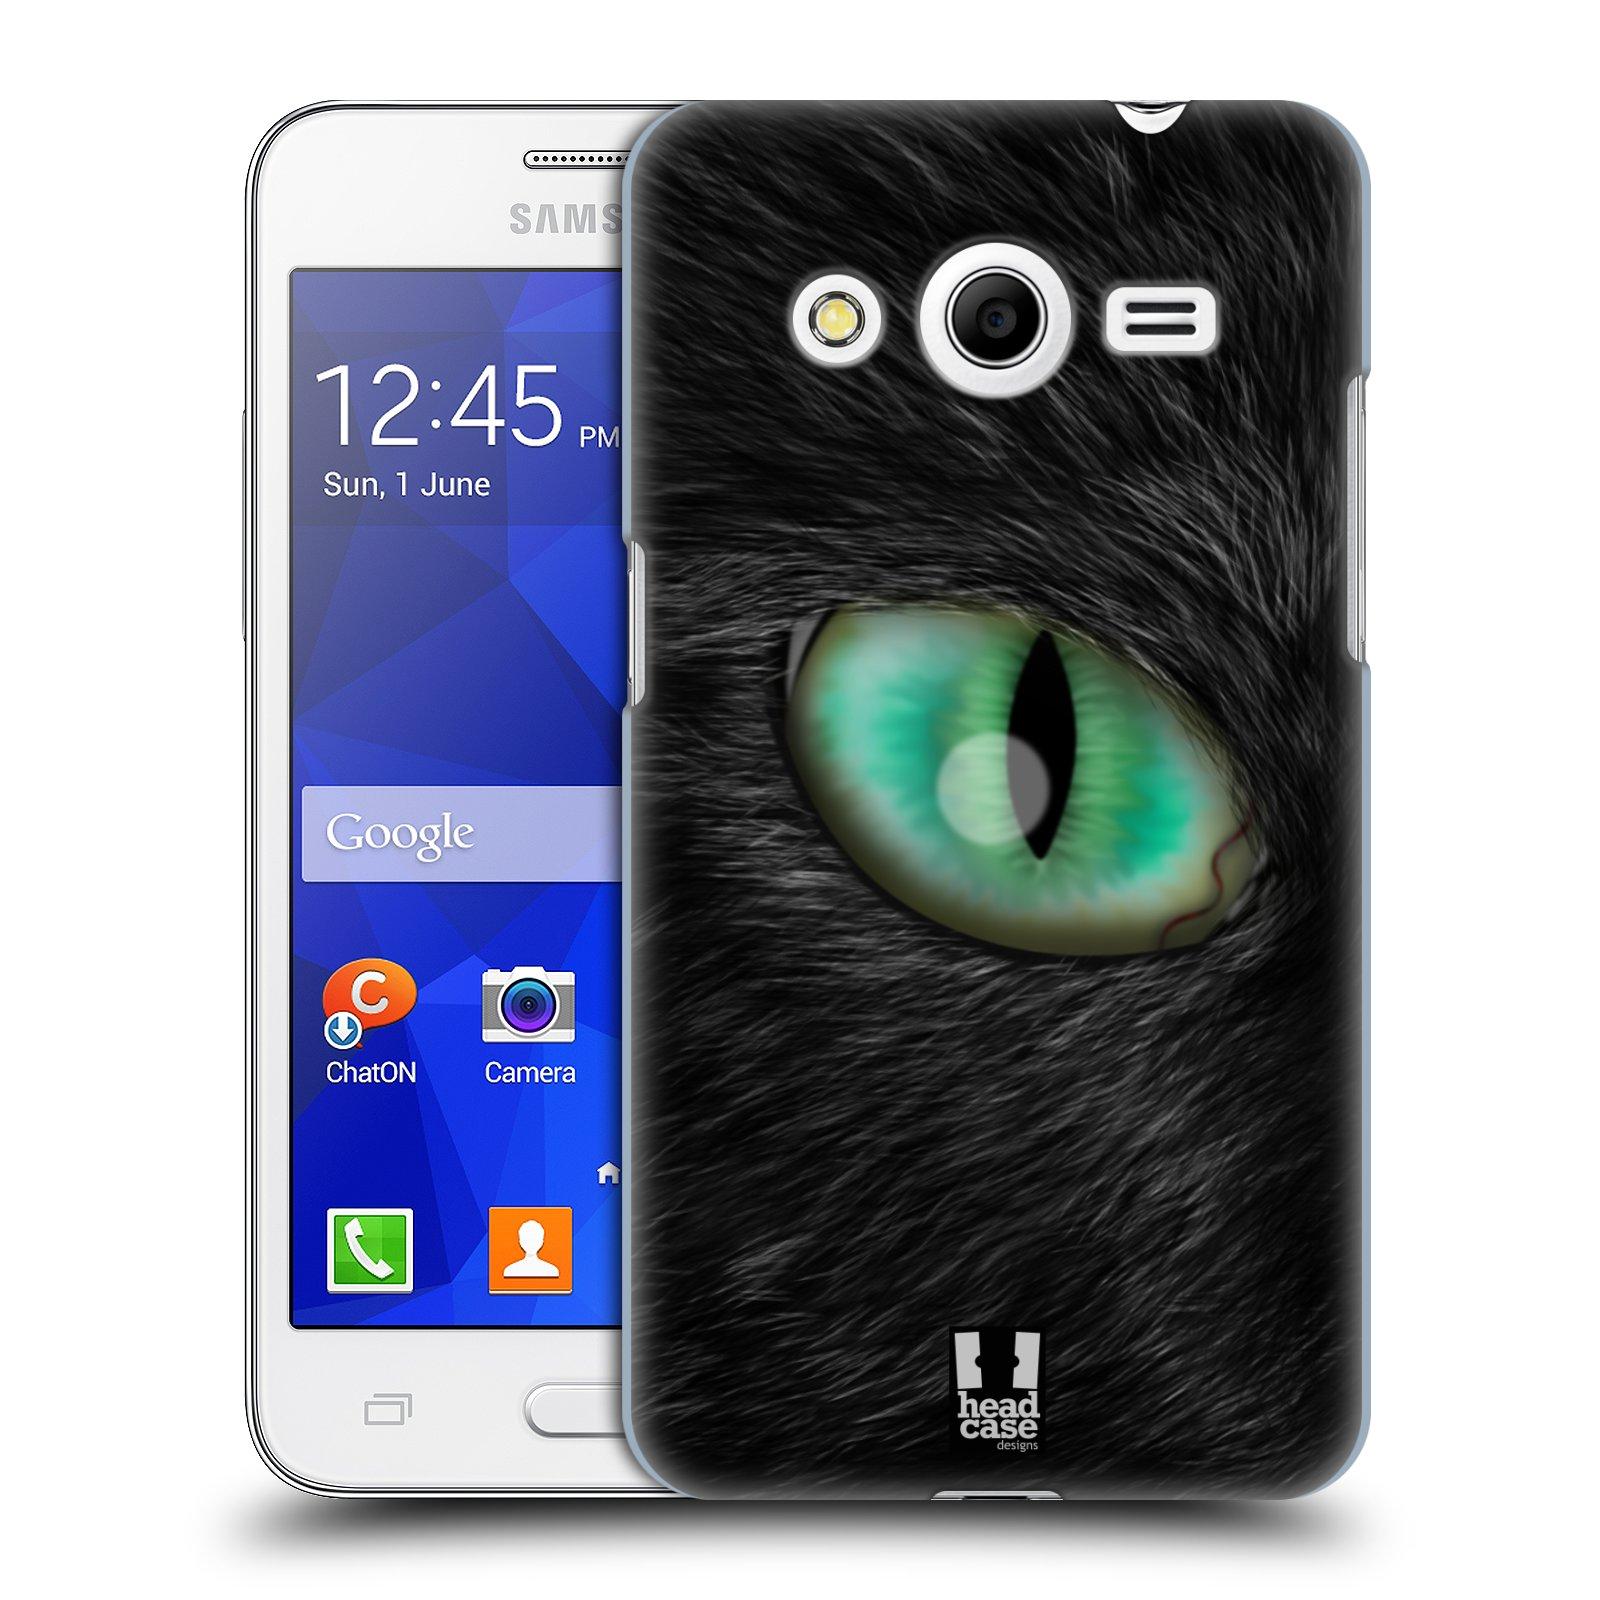 HEAD CASE plastový obal na mobil SAMSUNG GALAXY Core 2 (G355H) vzor pohled zvířete oko kočka